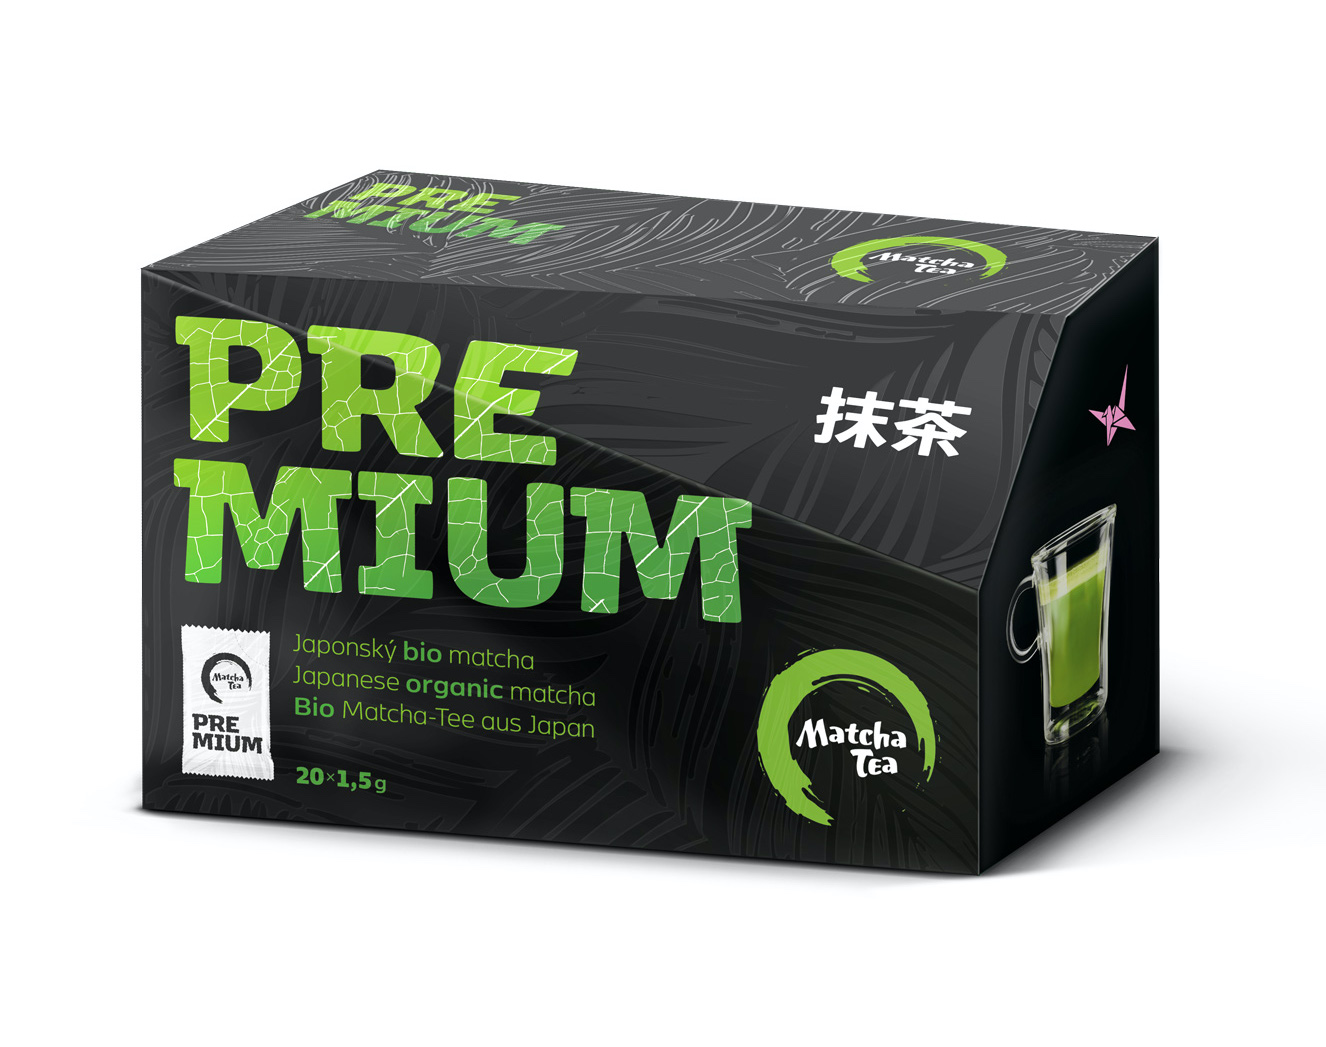 matcha-tea_premium_vizualizace_092019